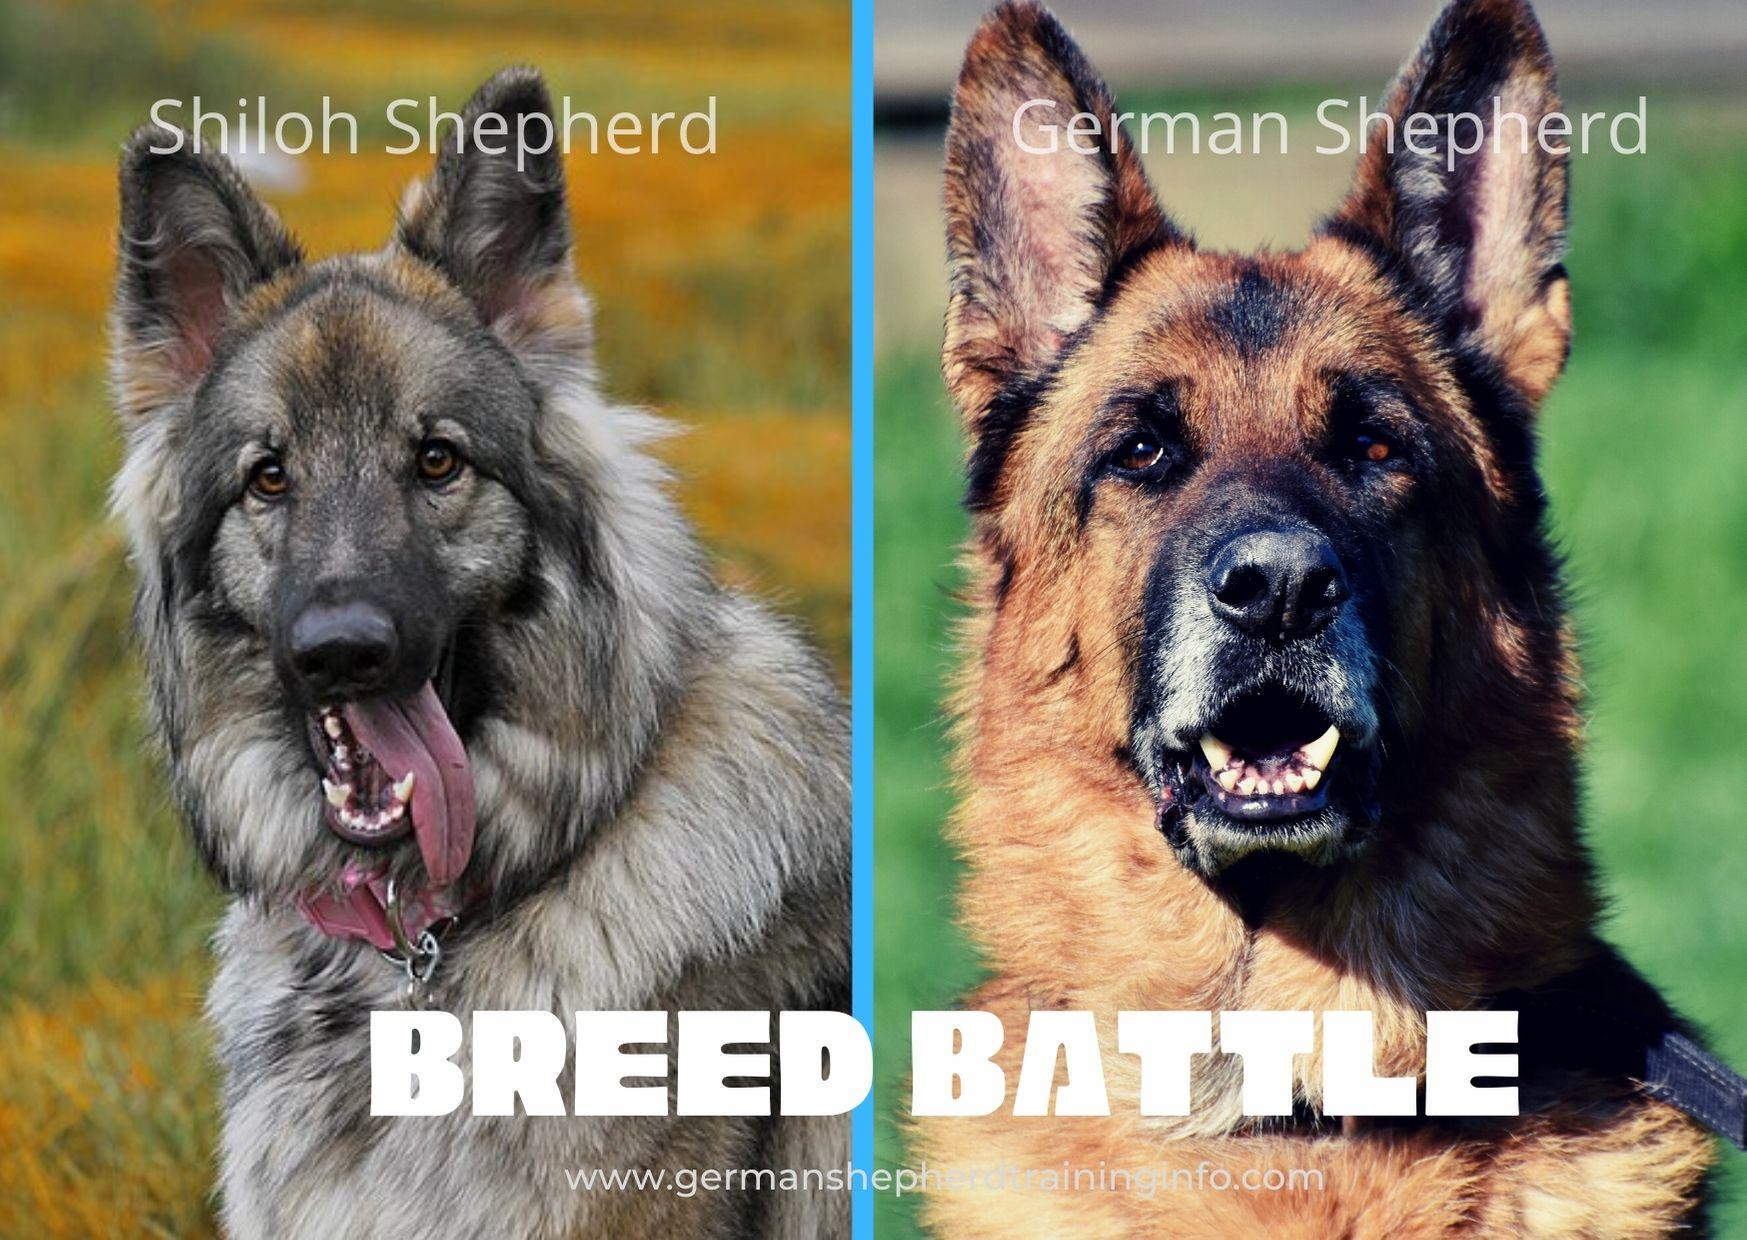 German Shepherd Vs Shiloh Shepherd : Size, Temperament, Coat, Energy, Comparison Guide